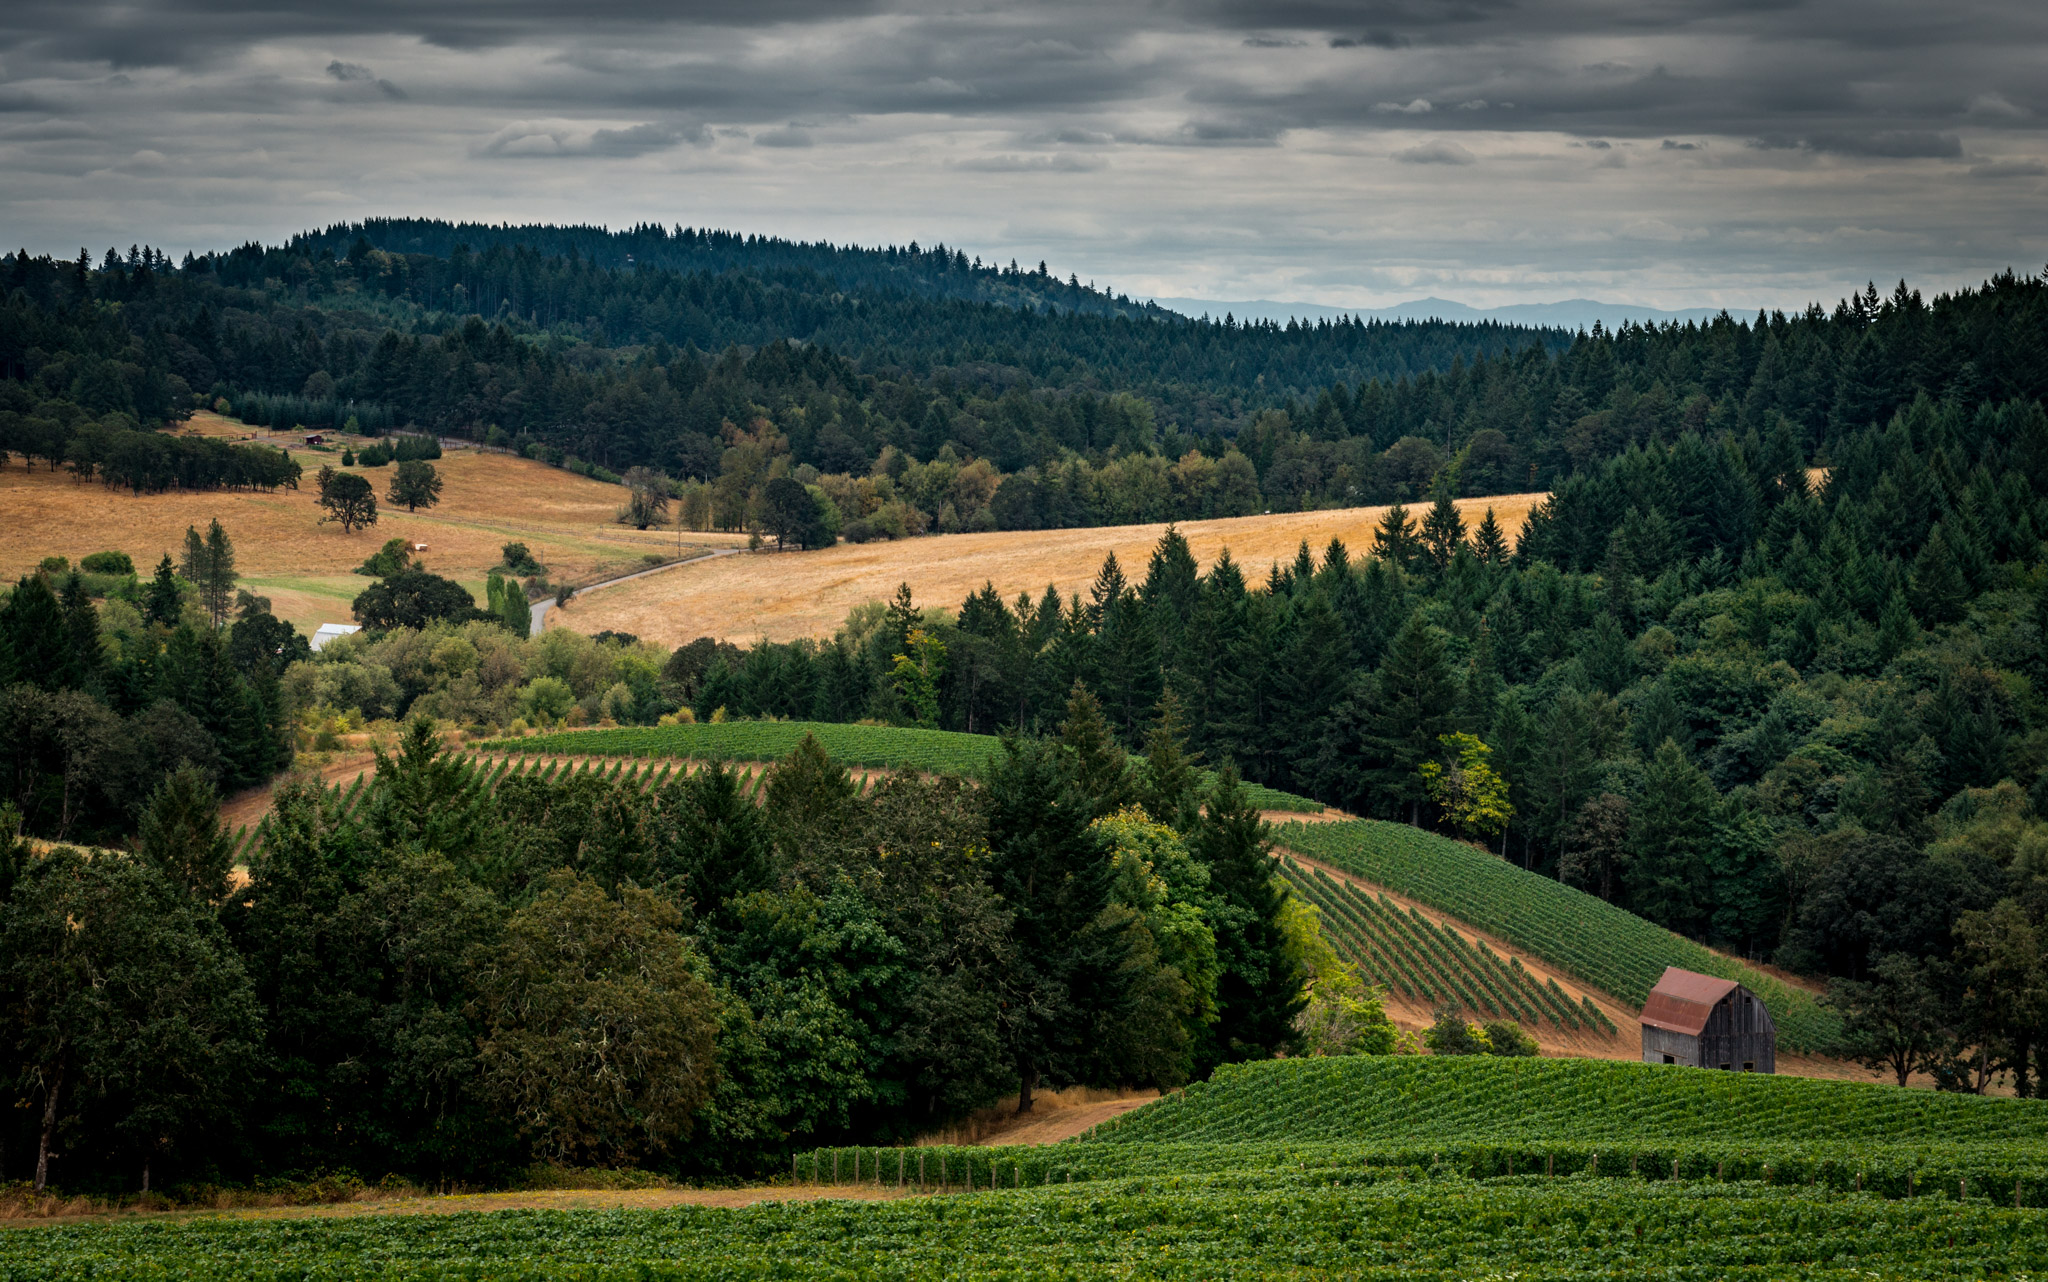 US : Oregon : Vineyards surrounding Colene Clemens in the Chehalem Mountains AVA